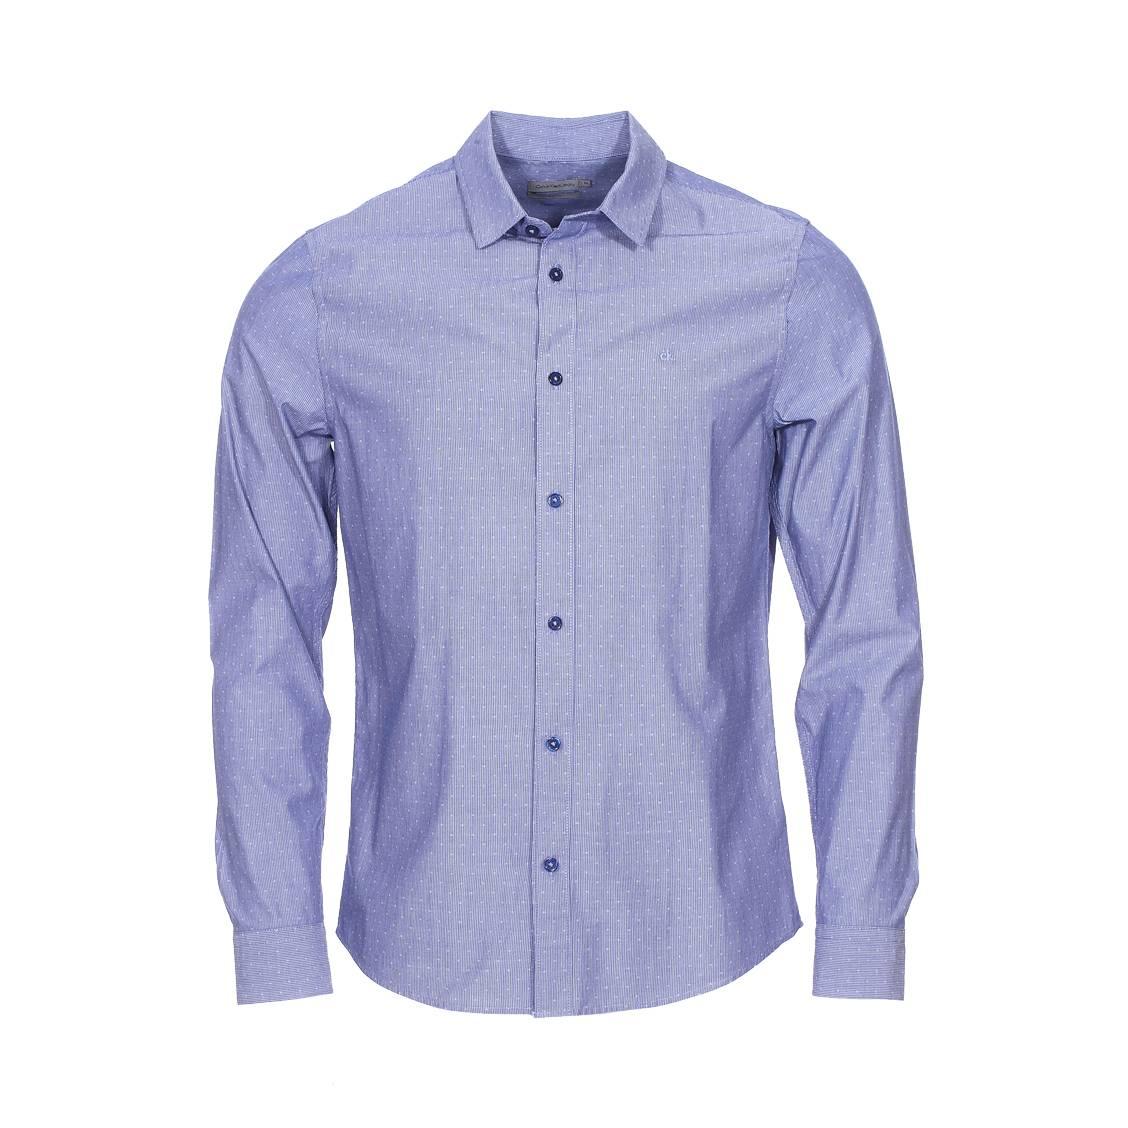 Chemise cintrée calvin klein wilbens à fines rayures blanches et bleu indigo